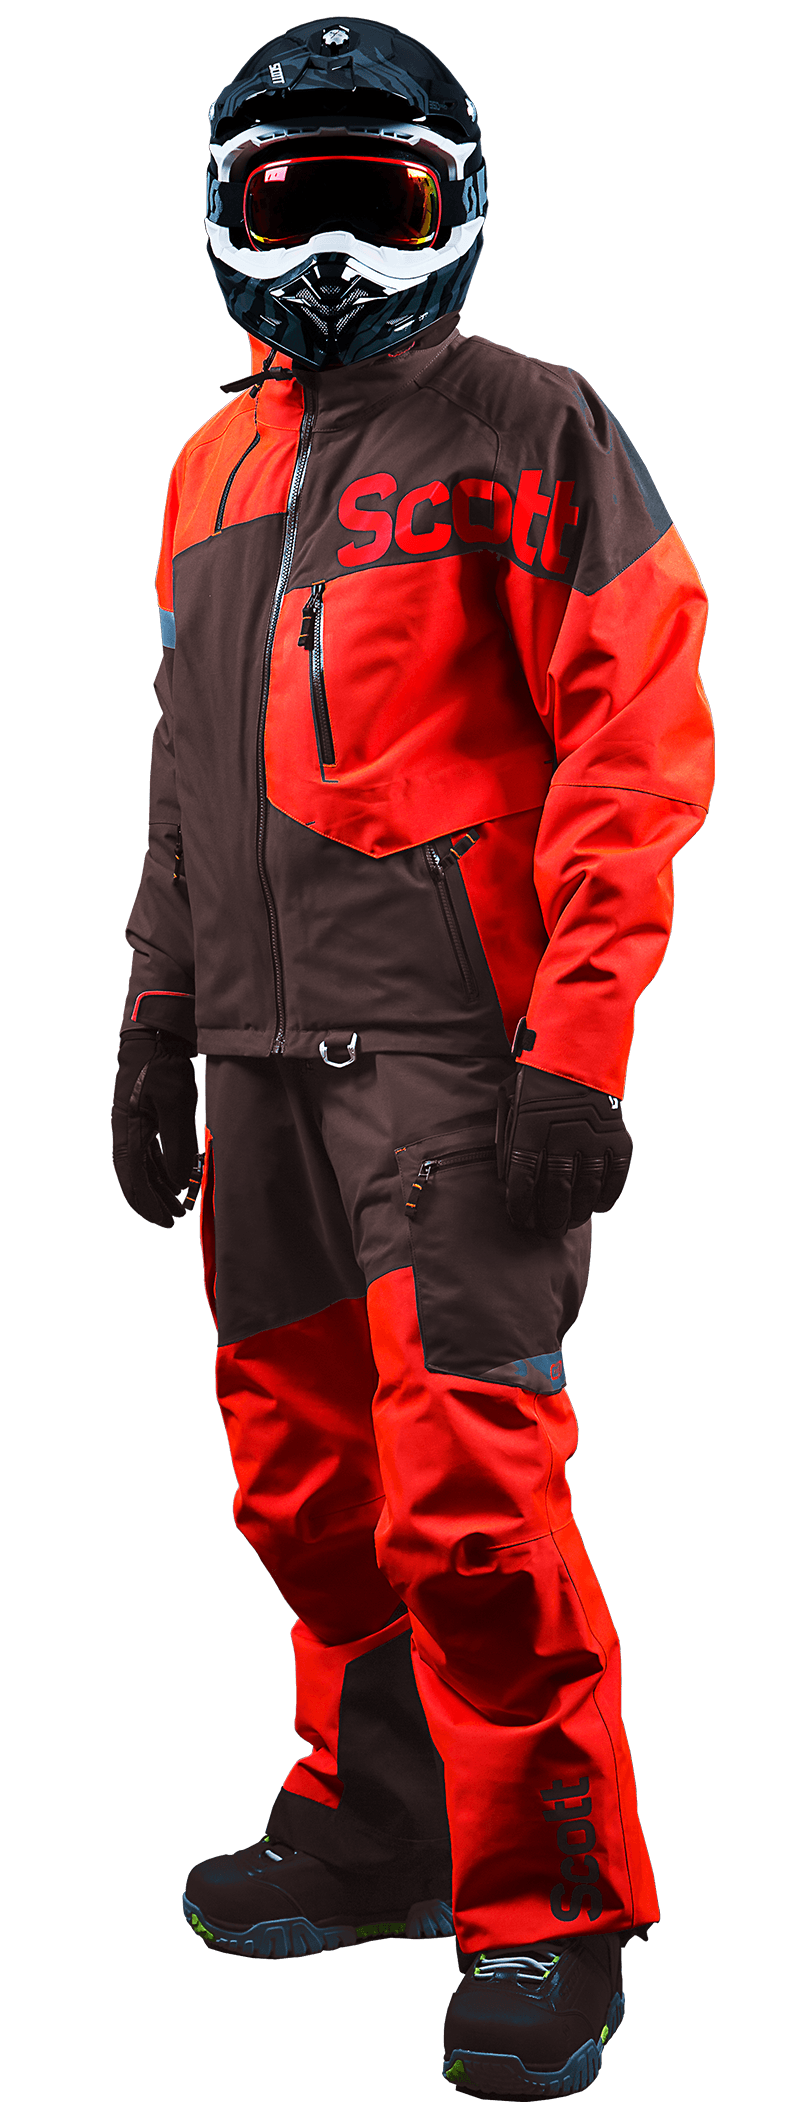 Snow Mobile Clothing : Snowmobile gear scott